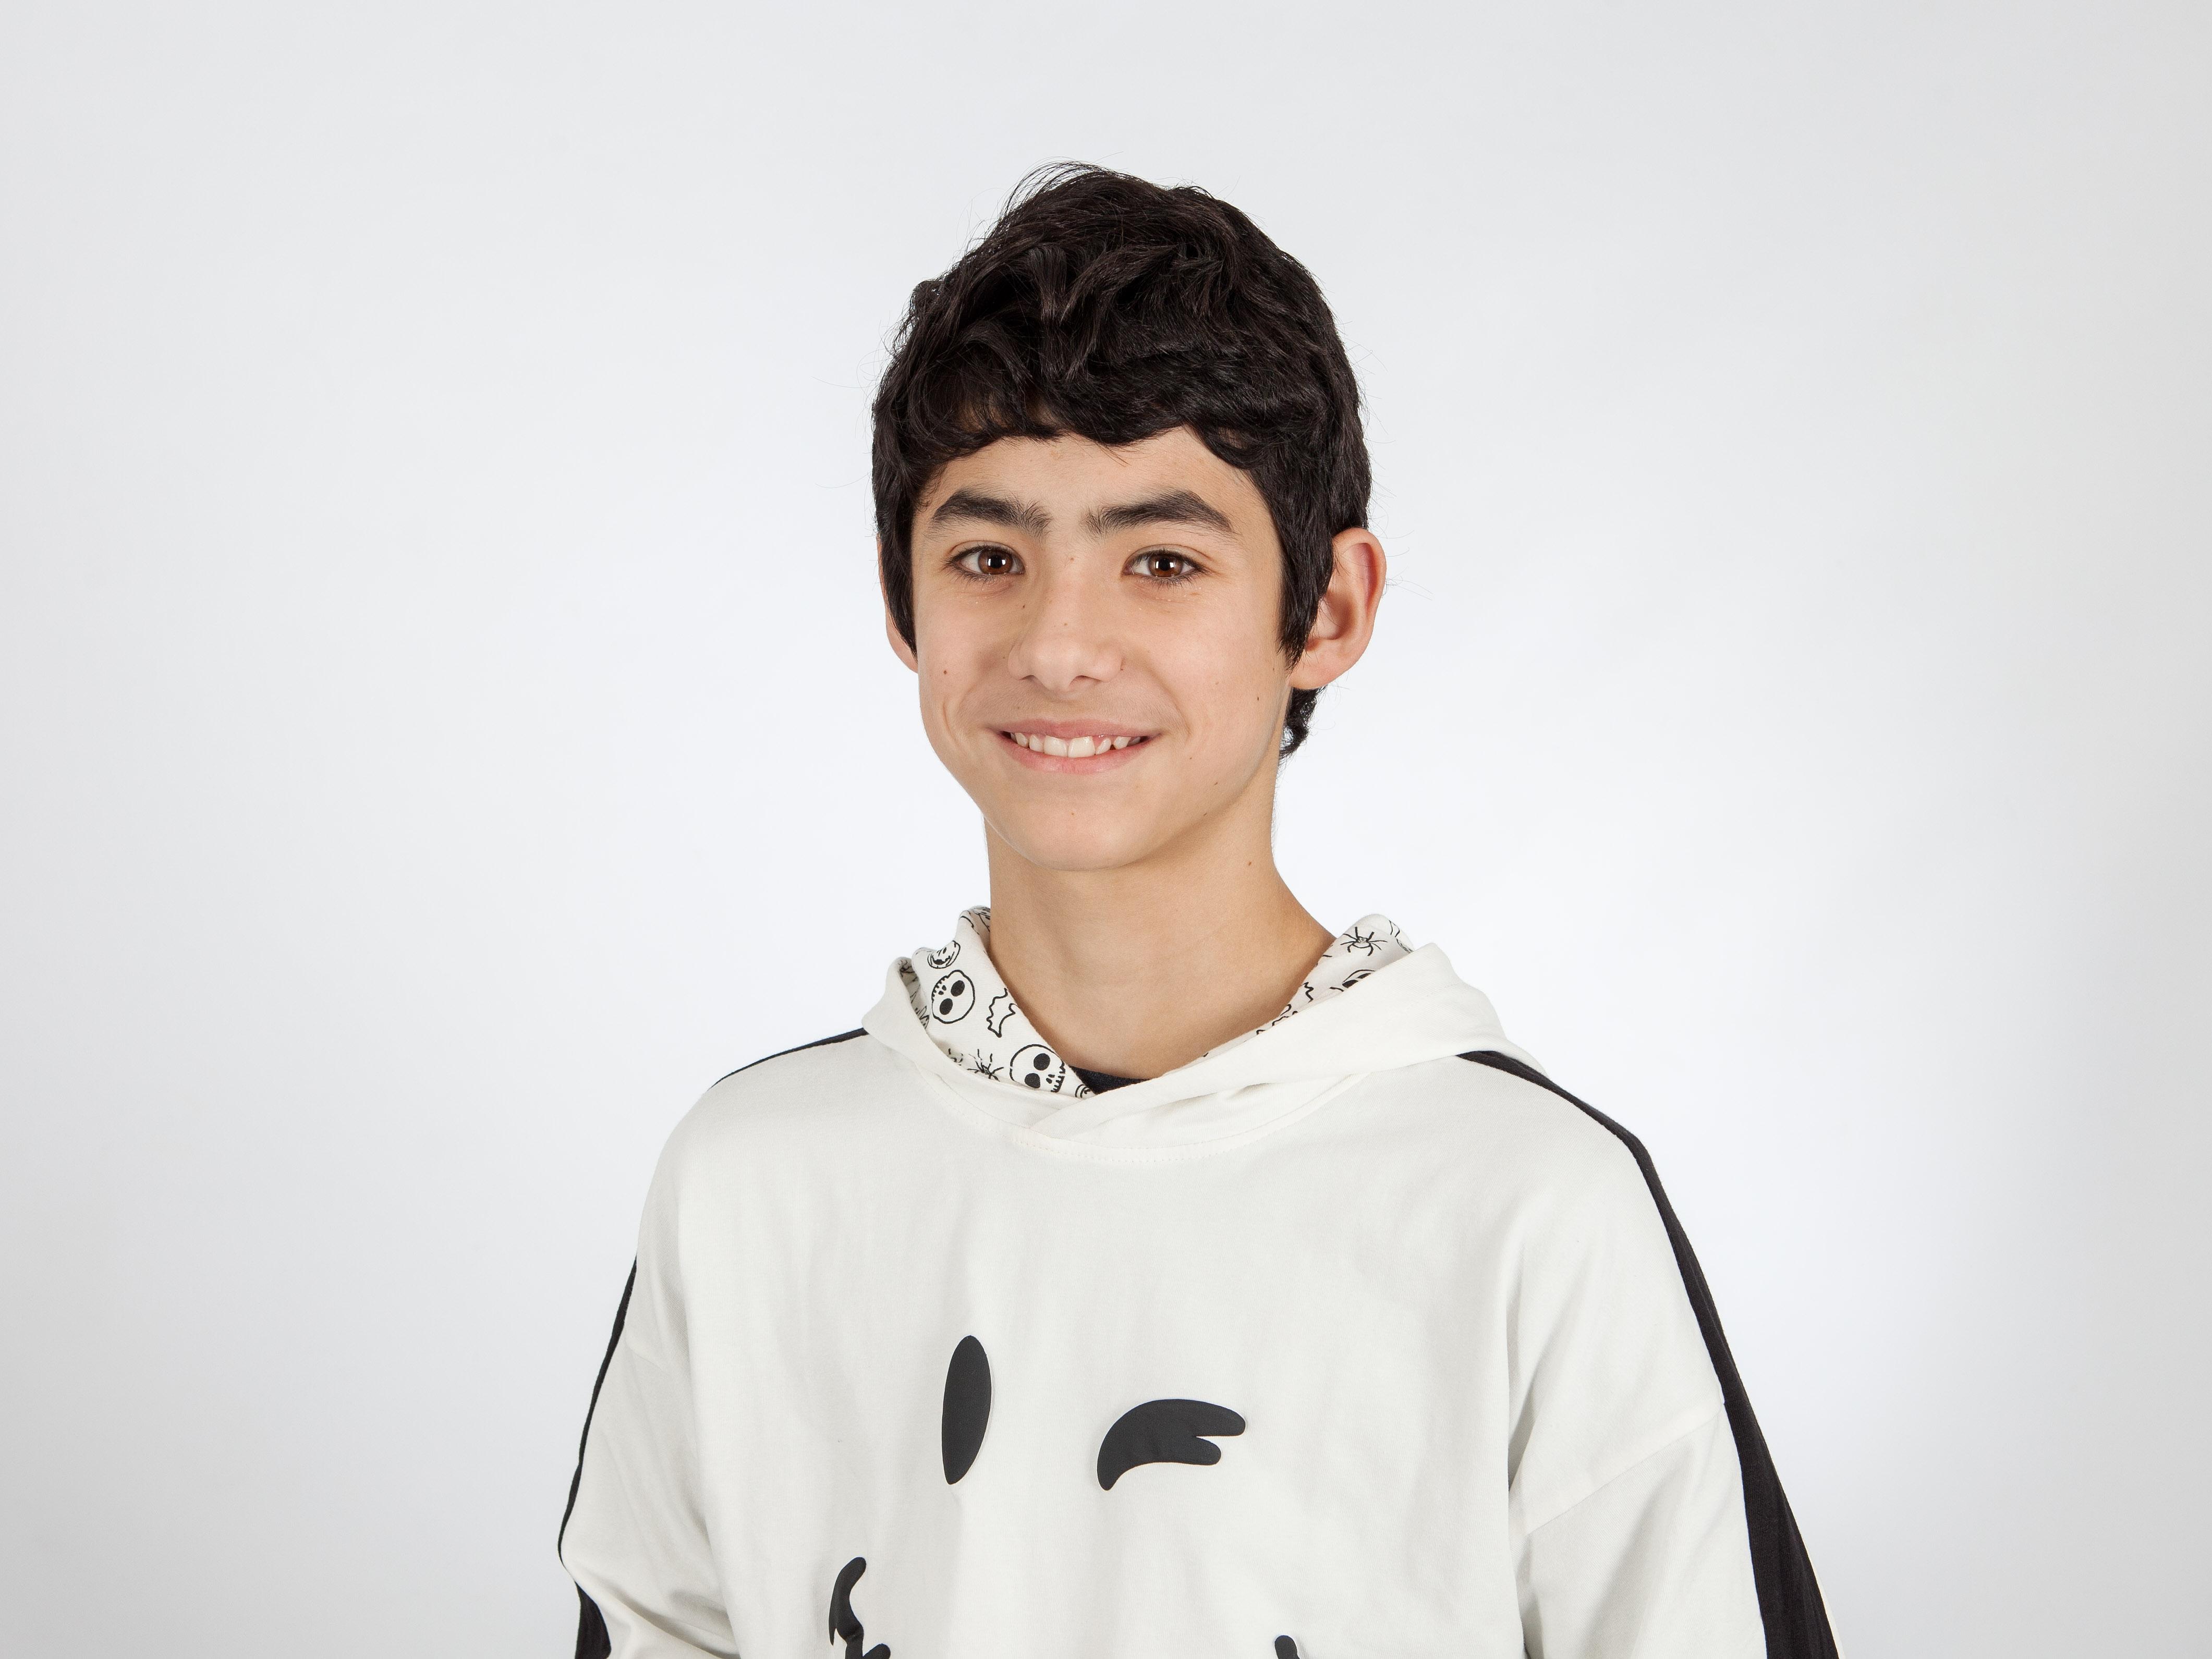 Xoel Roupar